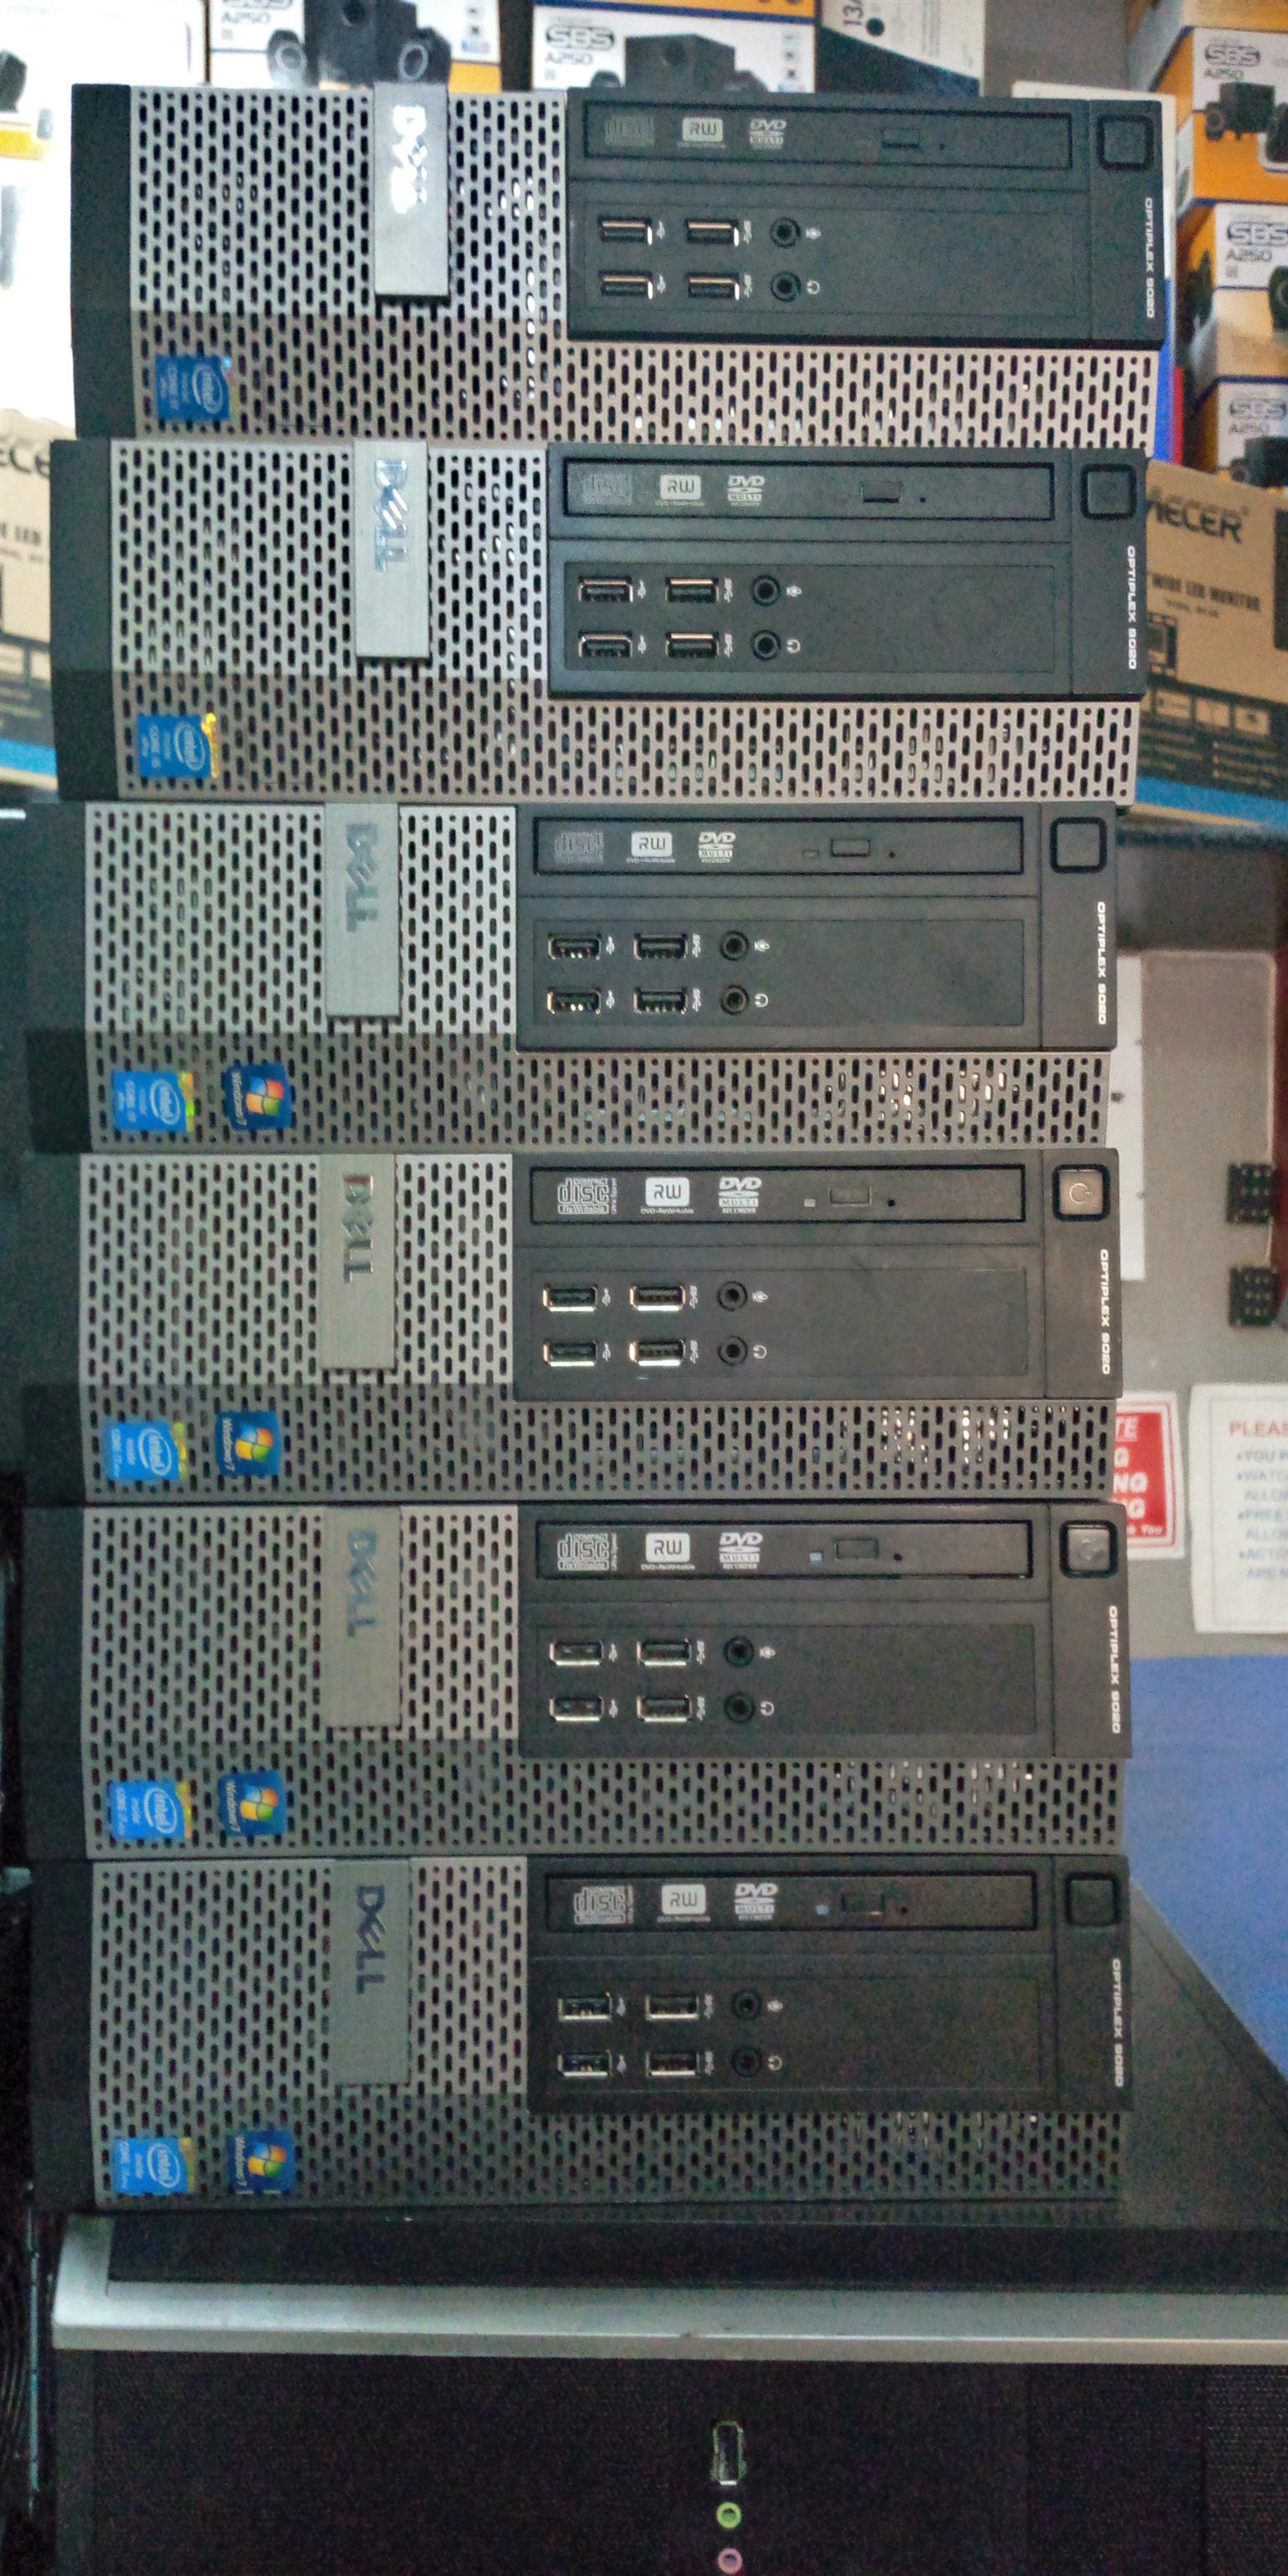 Dell optiplex 9020 SFF core i5 4th gen 4GB Ram 250gb HDDwindows 7 pro